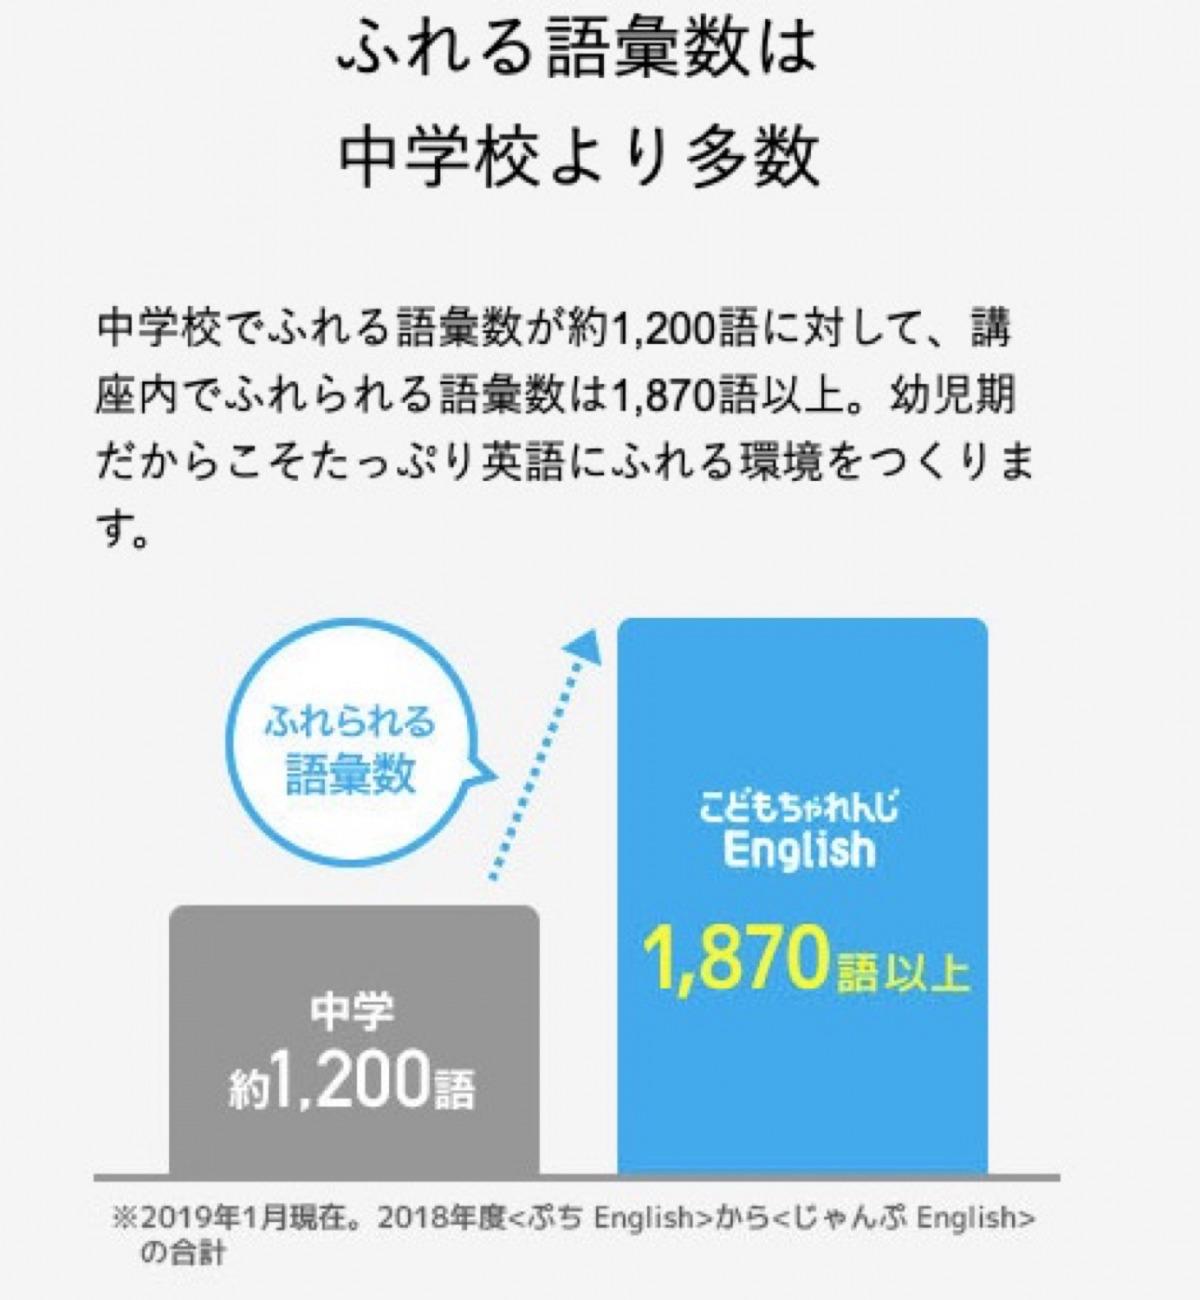 kodomo-challenge-english